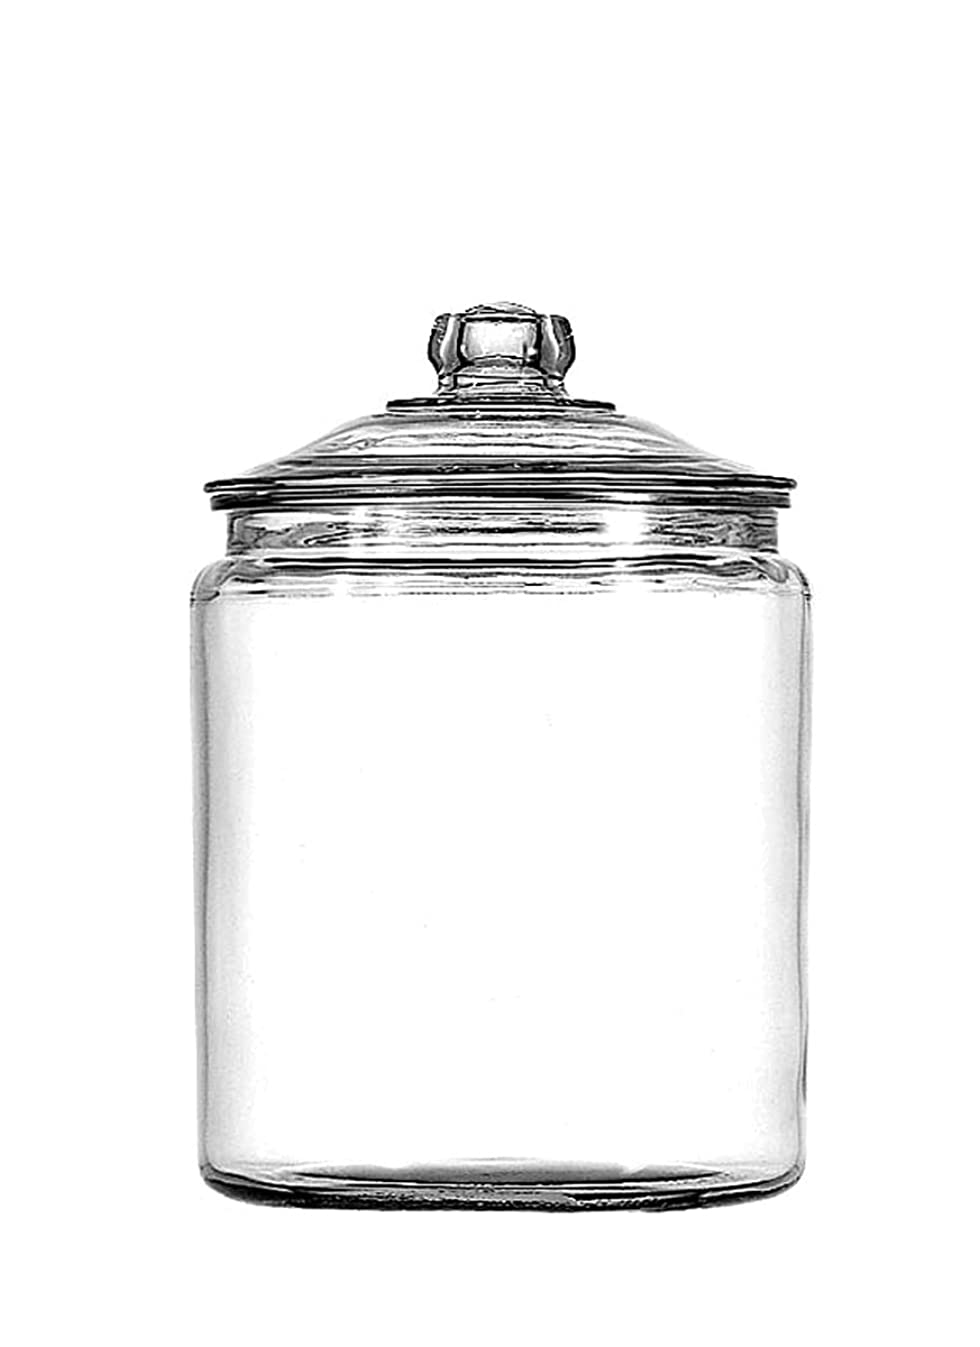 Anchor Hocking Heritage Hill Glass 0.5 Gallon Storage Jar, Set of 1